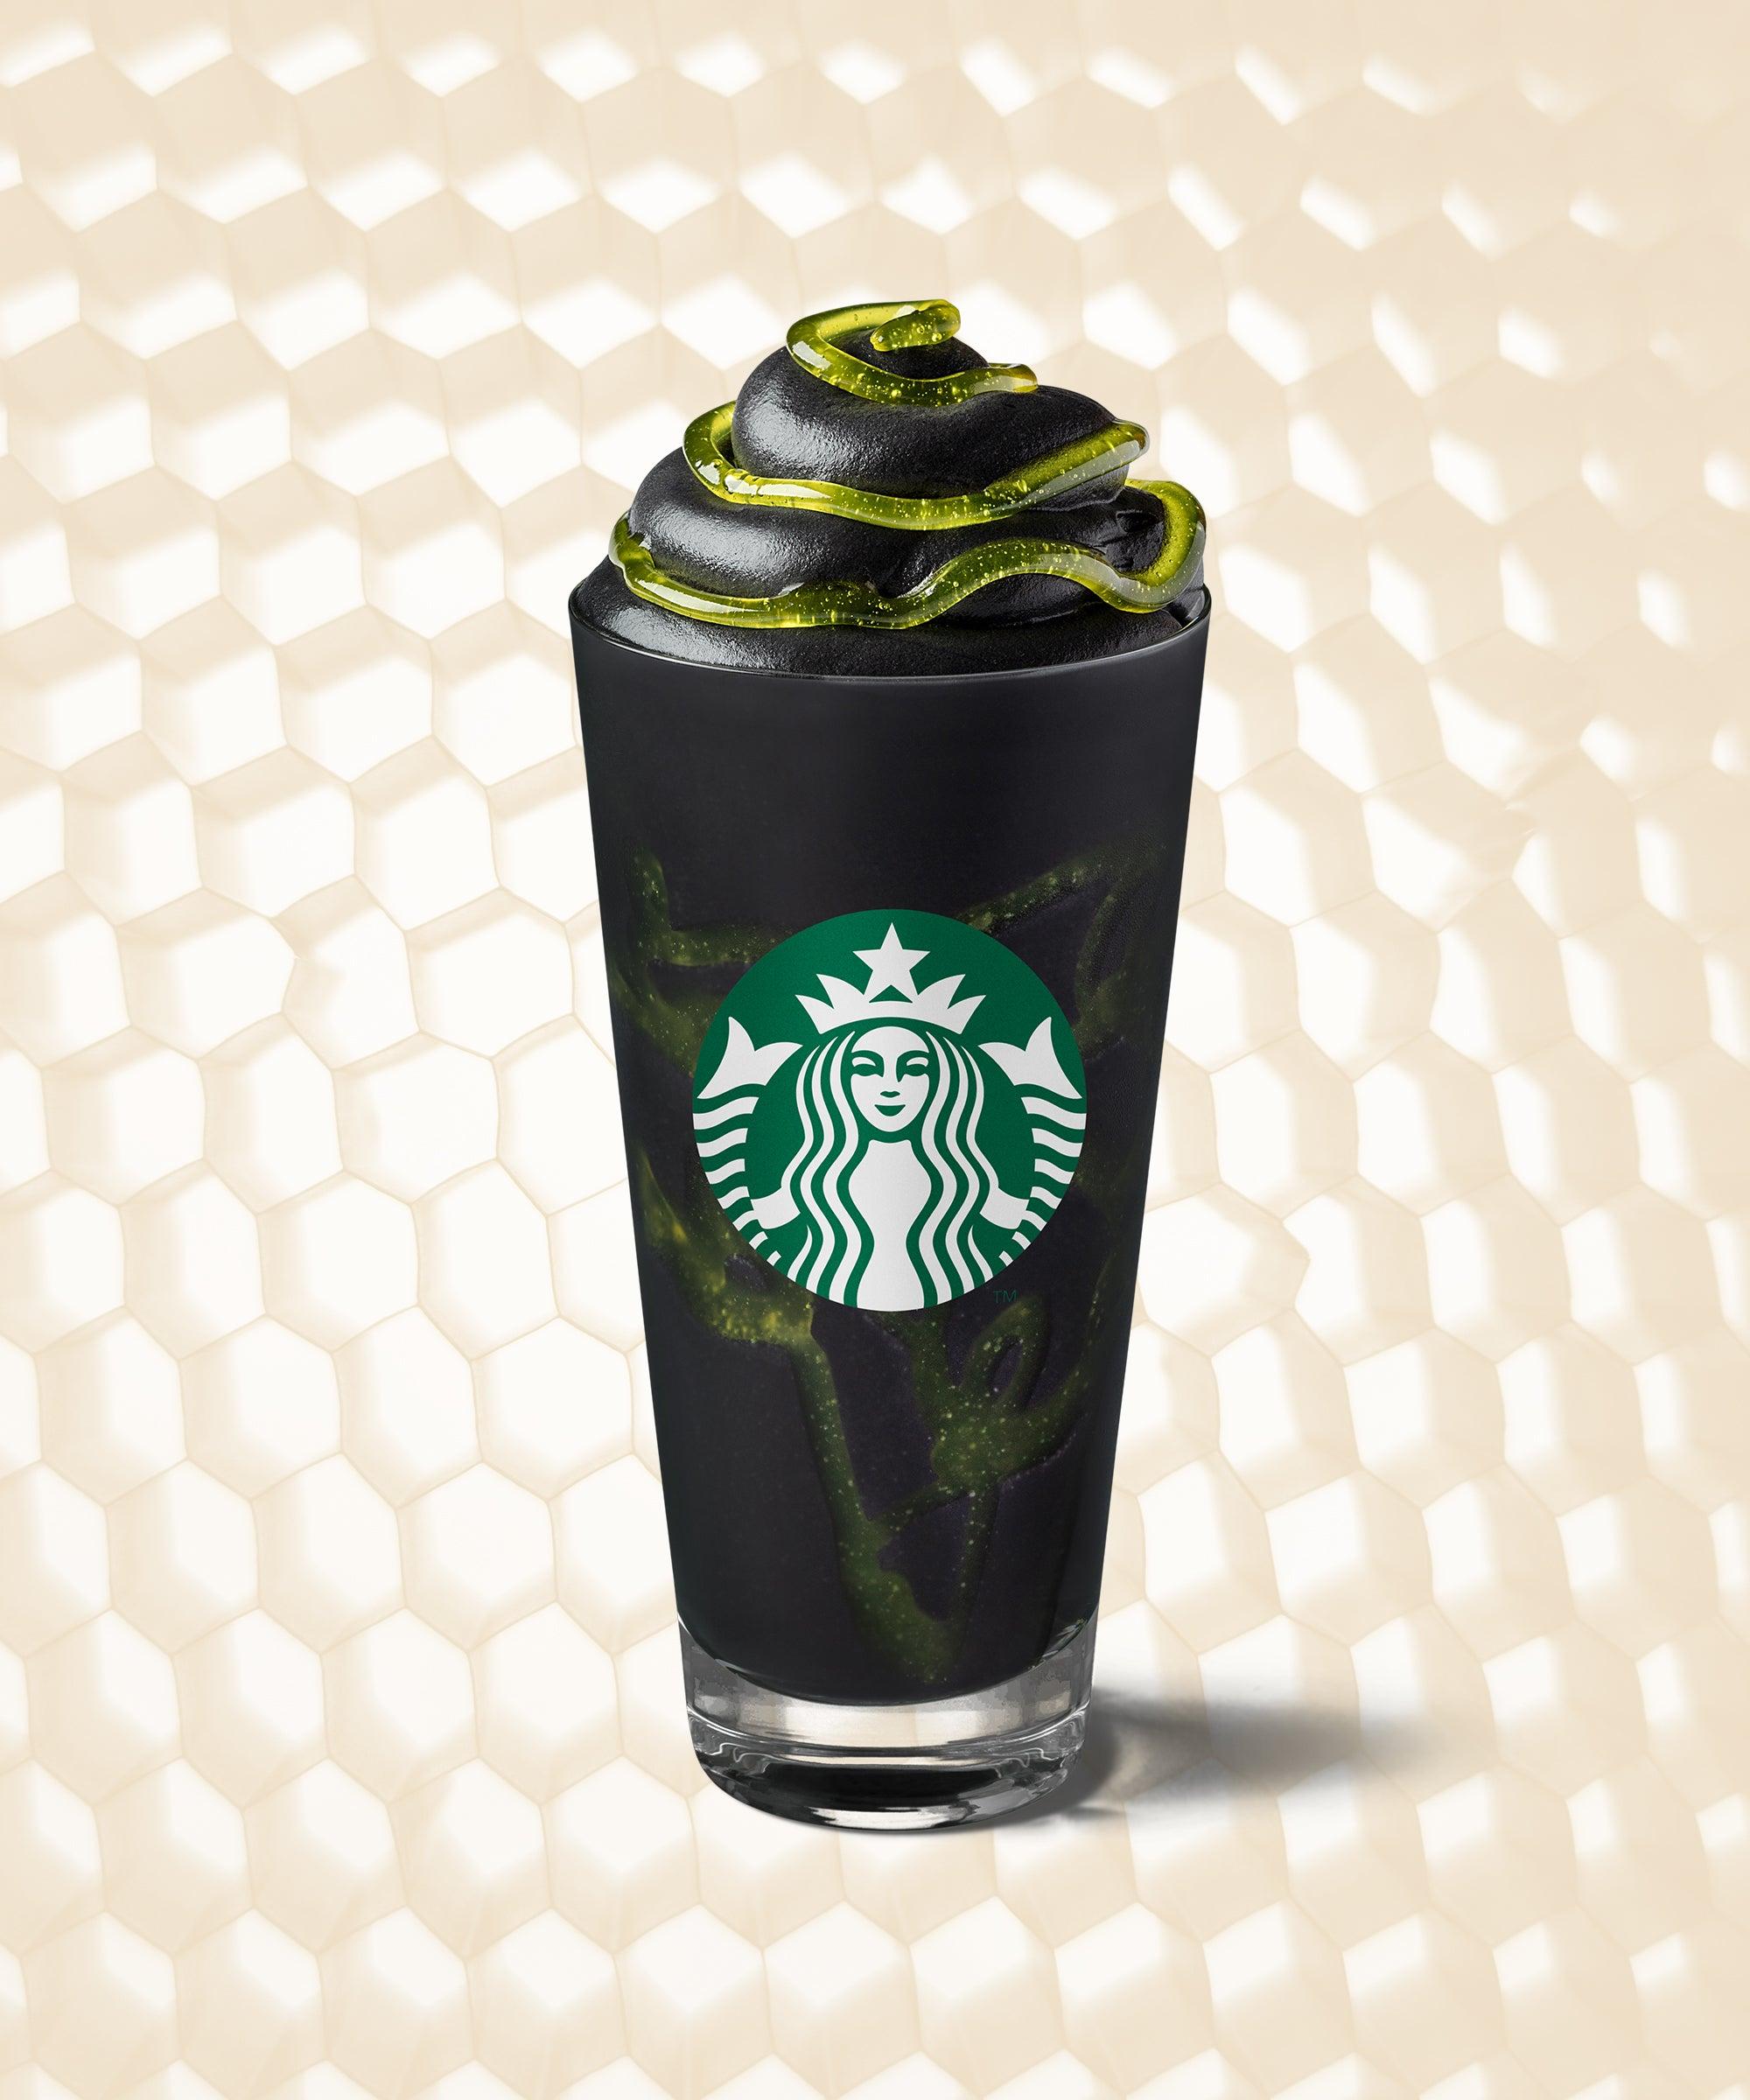 Starbucks Halloween Drink 2020 Starbucks New Phantom Frappuccino Halloween Drink 2019